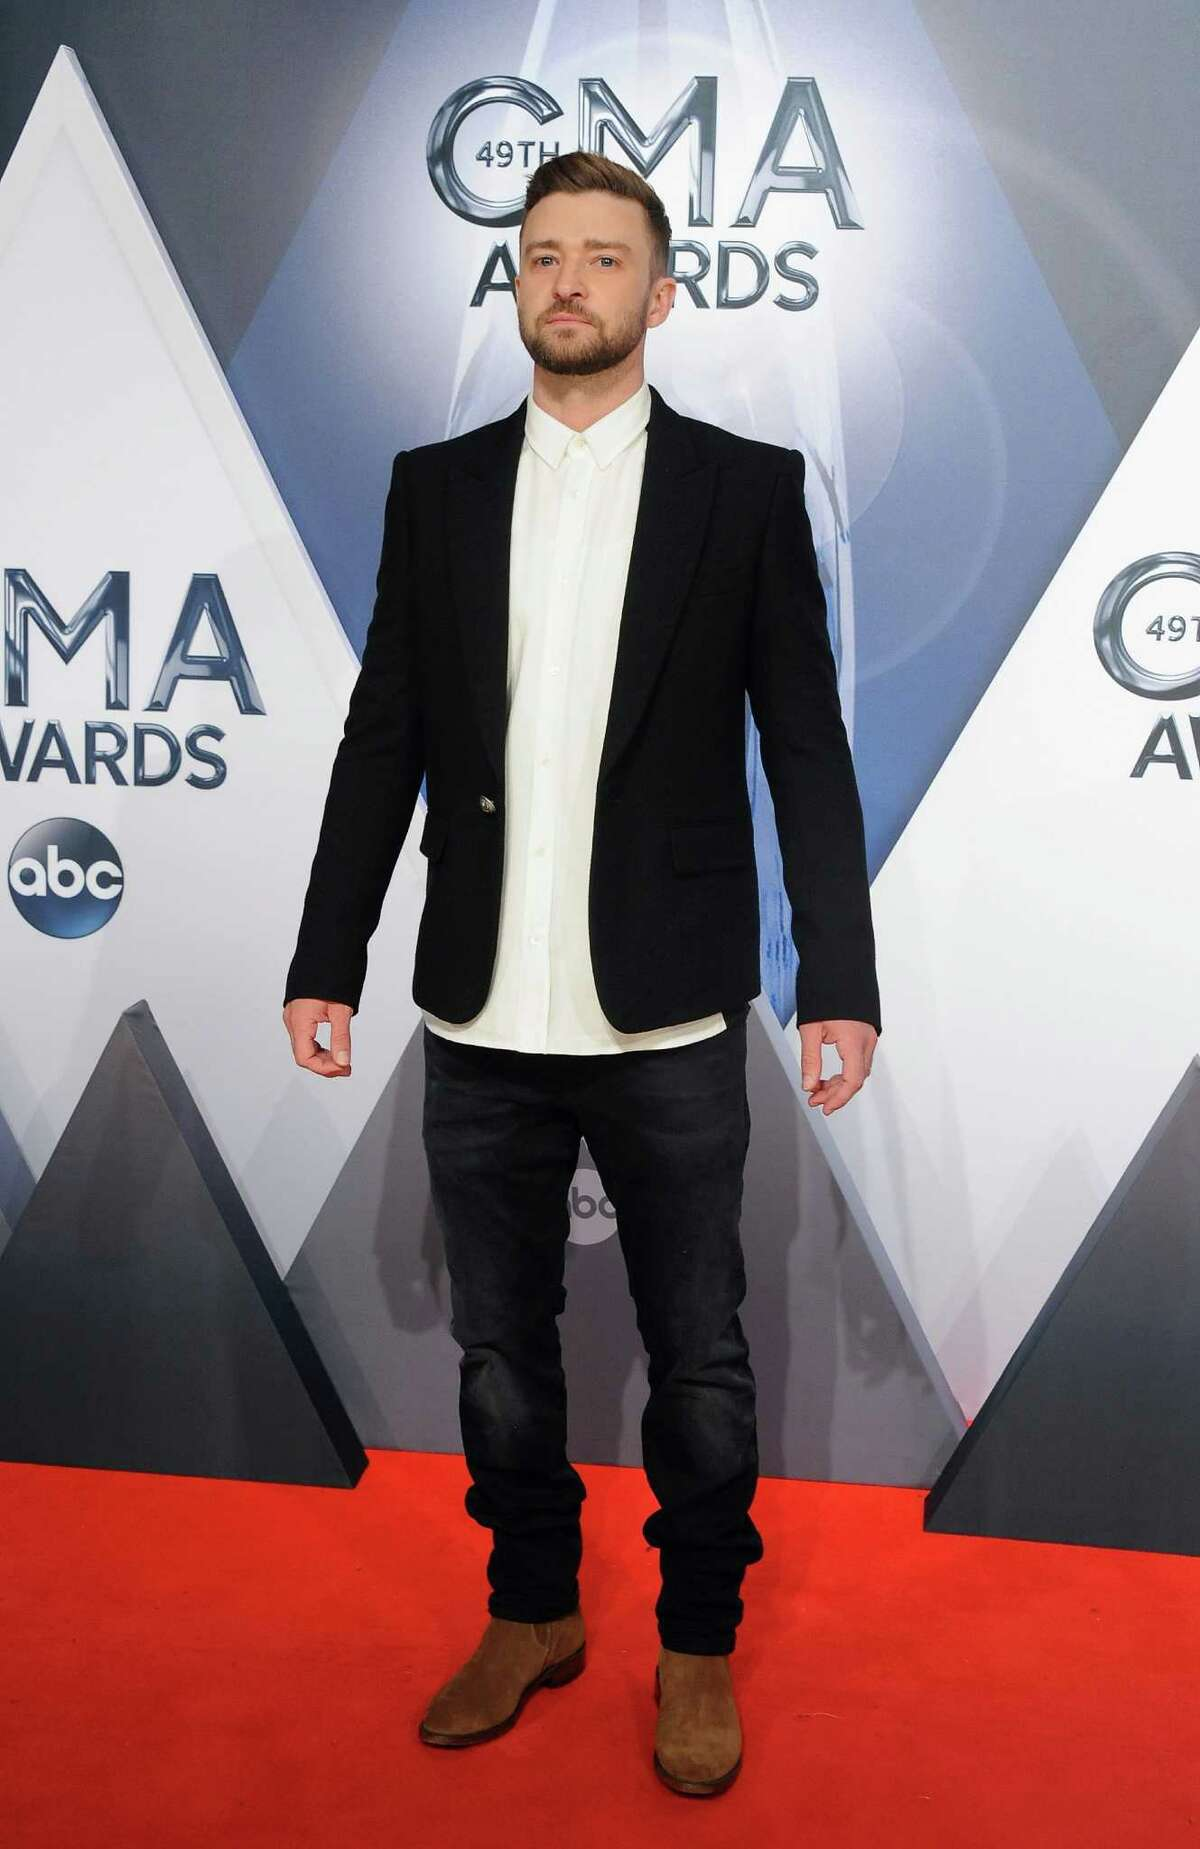 NASHVILLE, TN - NOVEMBER 04: Musician Justin Timberlake attends the 49th annual CMA Awards at the Bridgestone Arena on November 4, 2015 in Nashville, Tennessee. (Photo by Jon Kopaloff/FilmMagic)